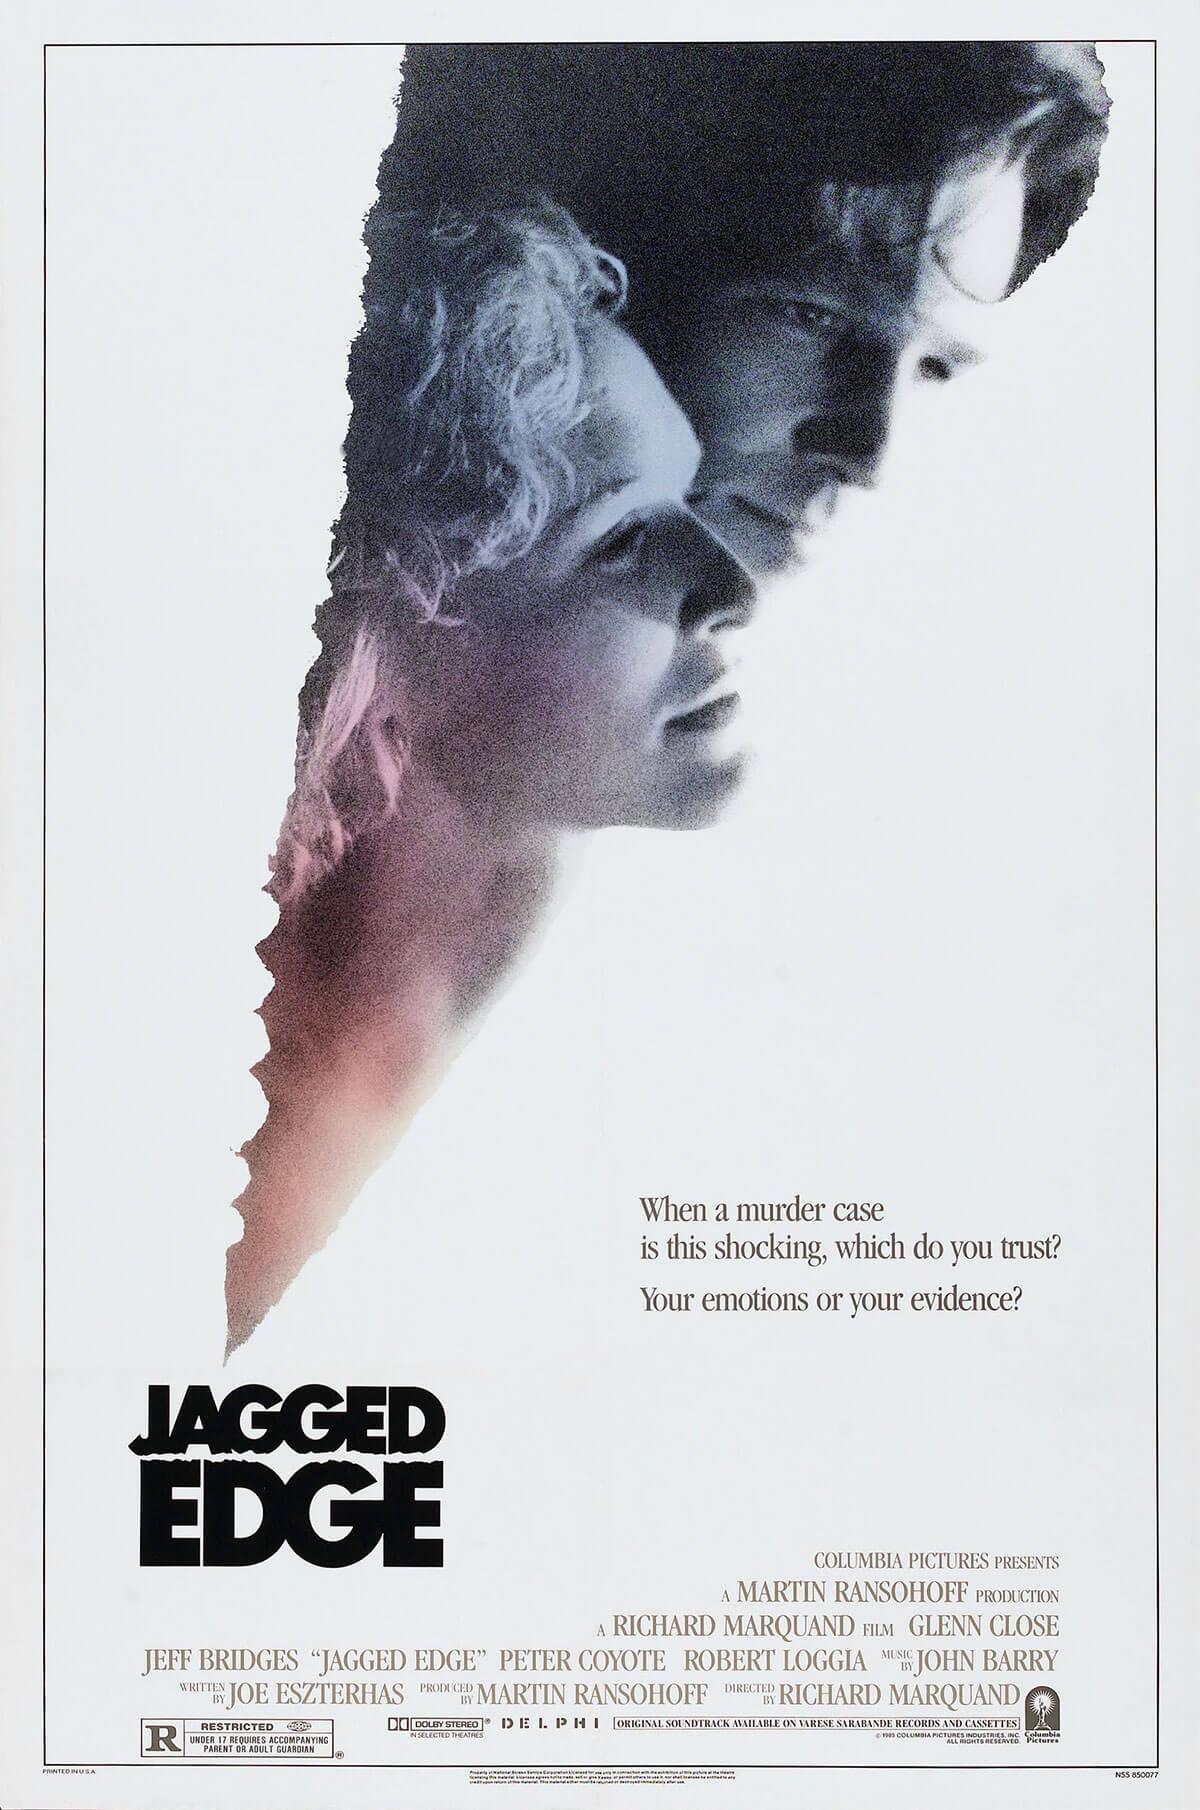 Jagged Edge, 1985